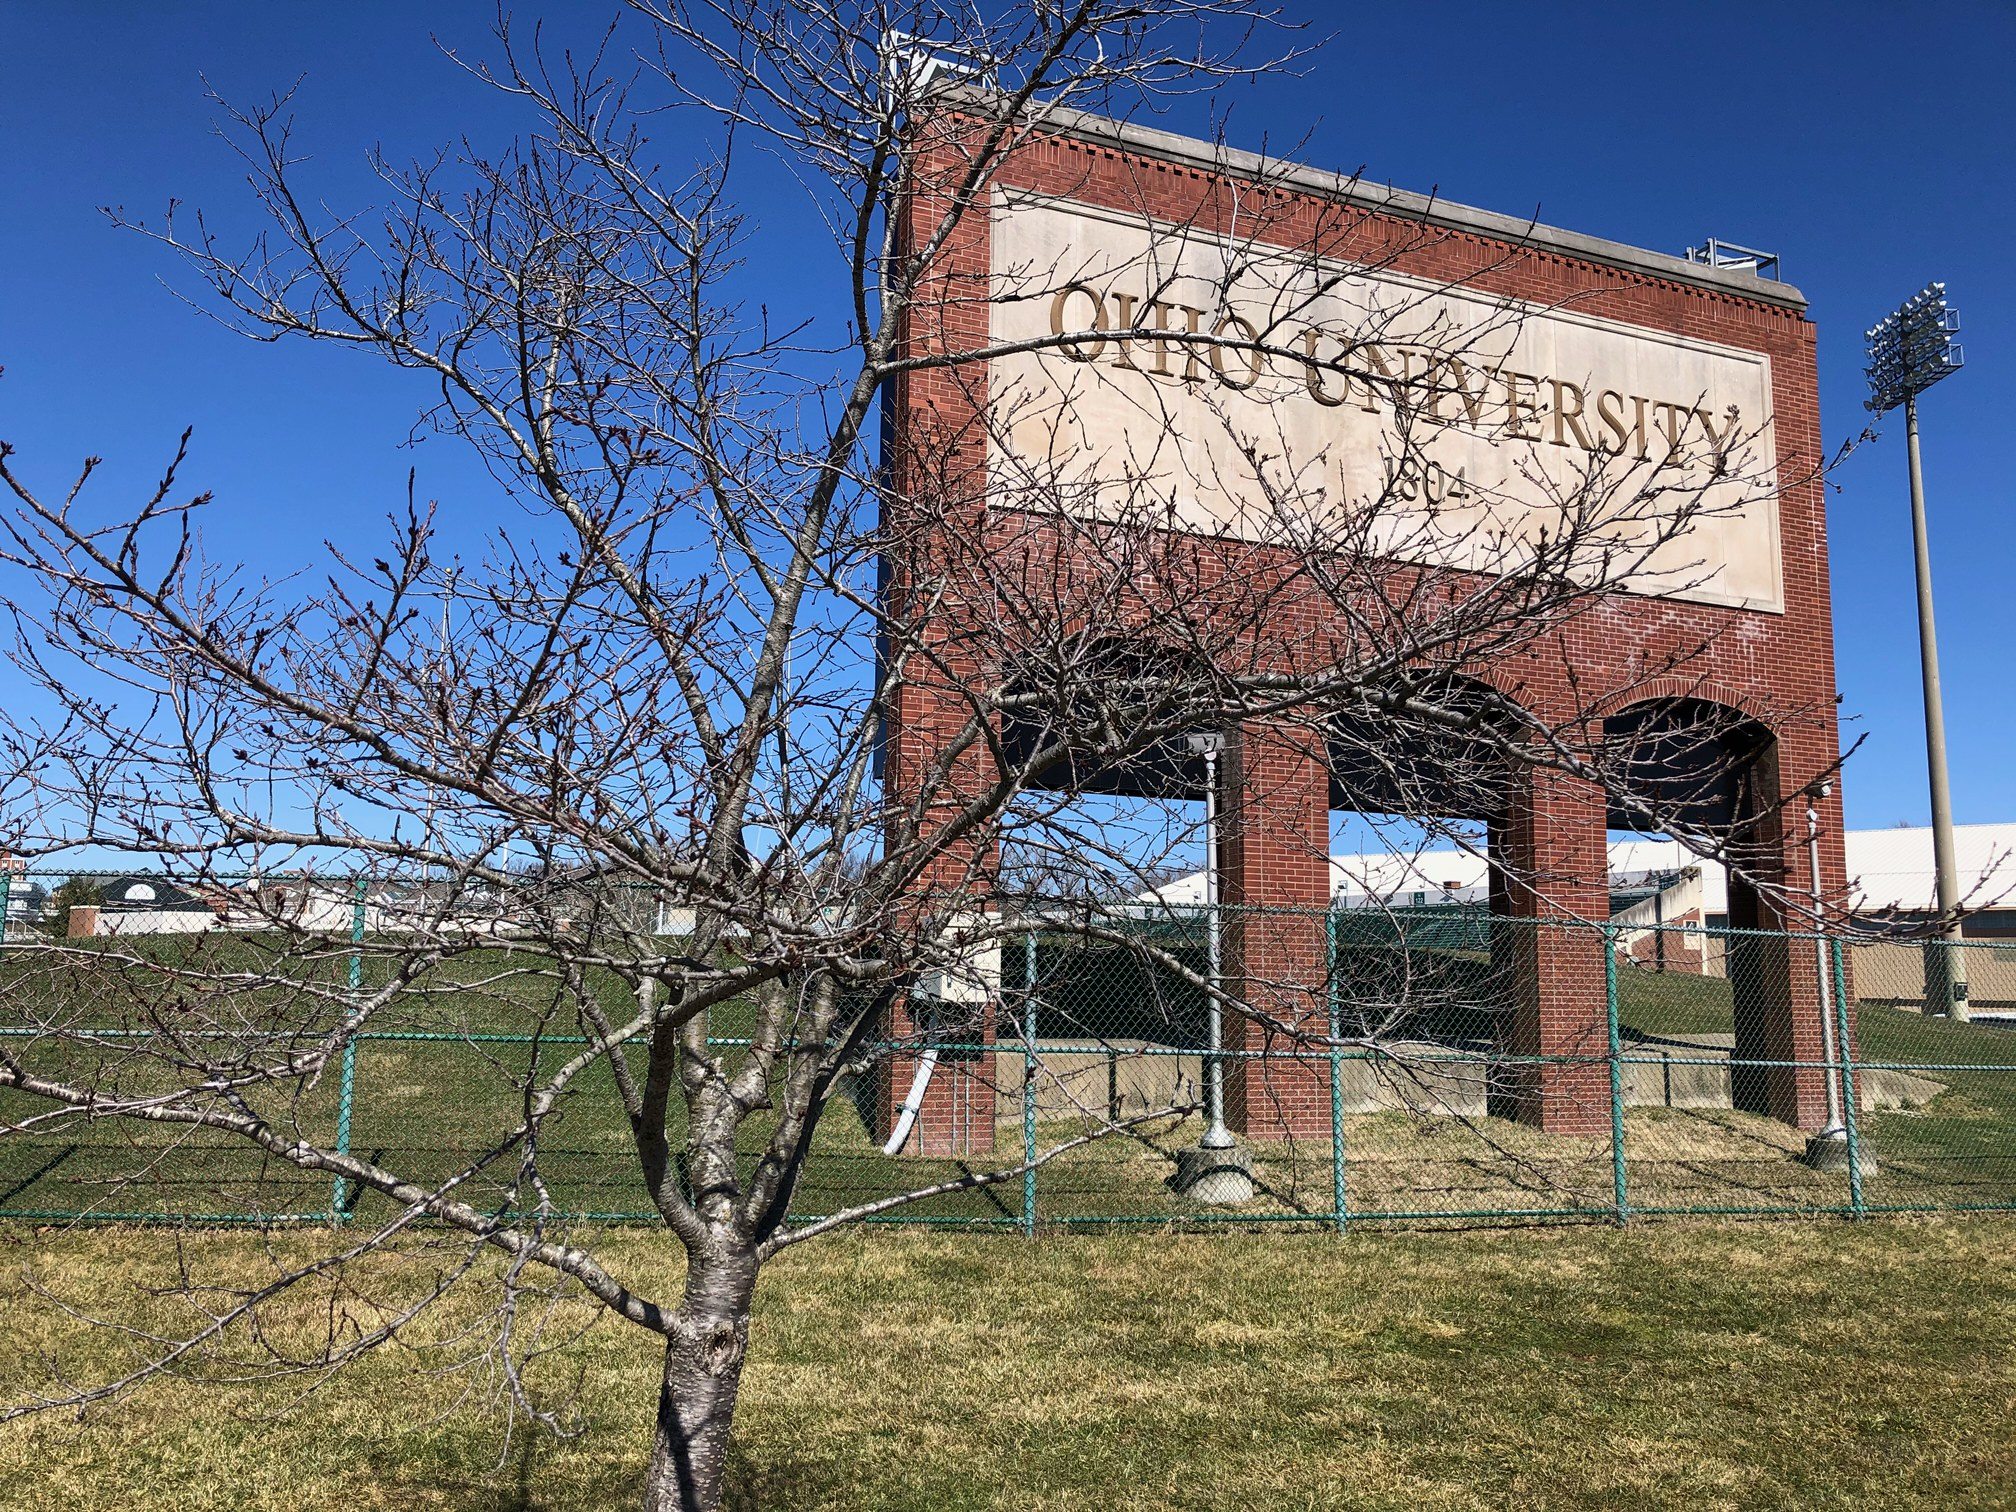 Bare cherry trees on March 2nd near Penden Stadium.